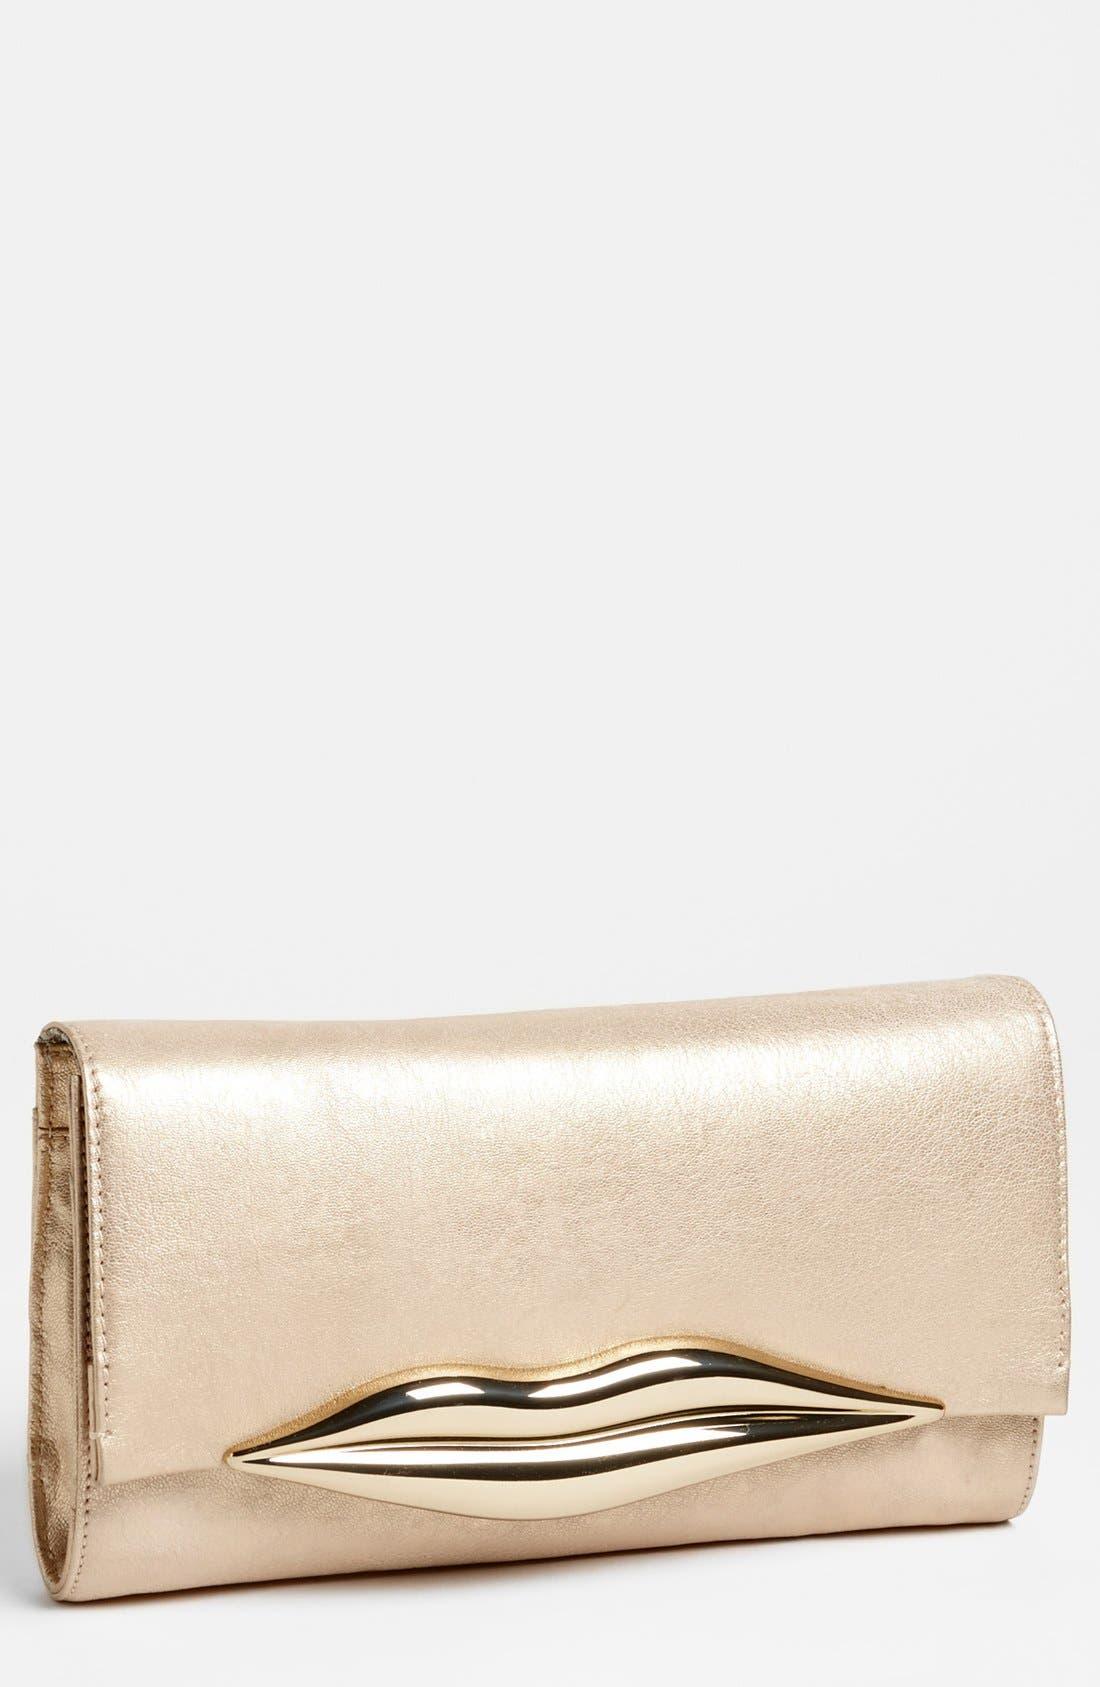 Alternate Image 1 Selected - Diane von Furstenberg 'Flirty' Leather Clutch